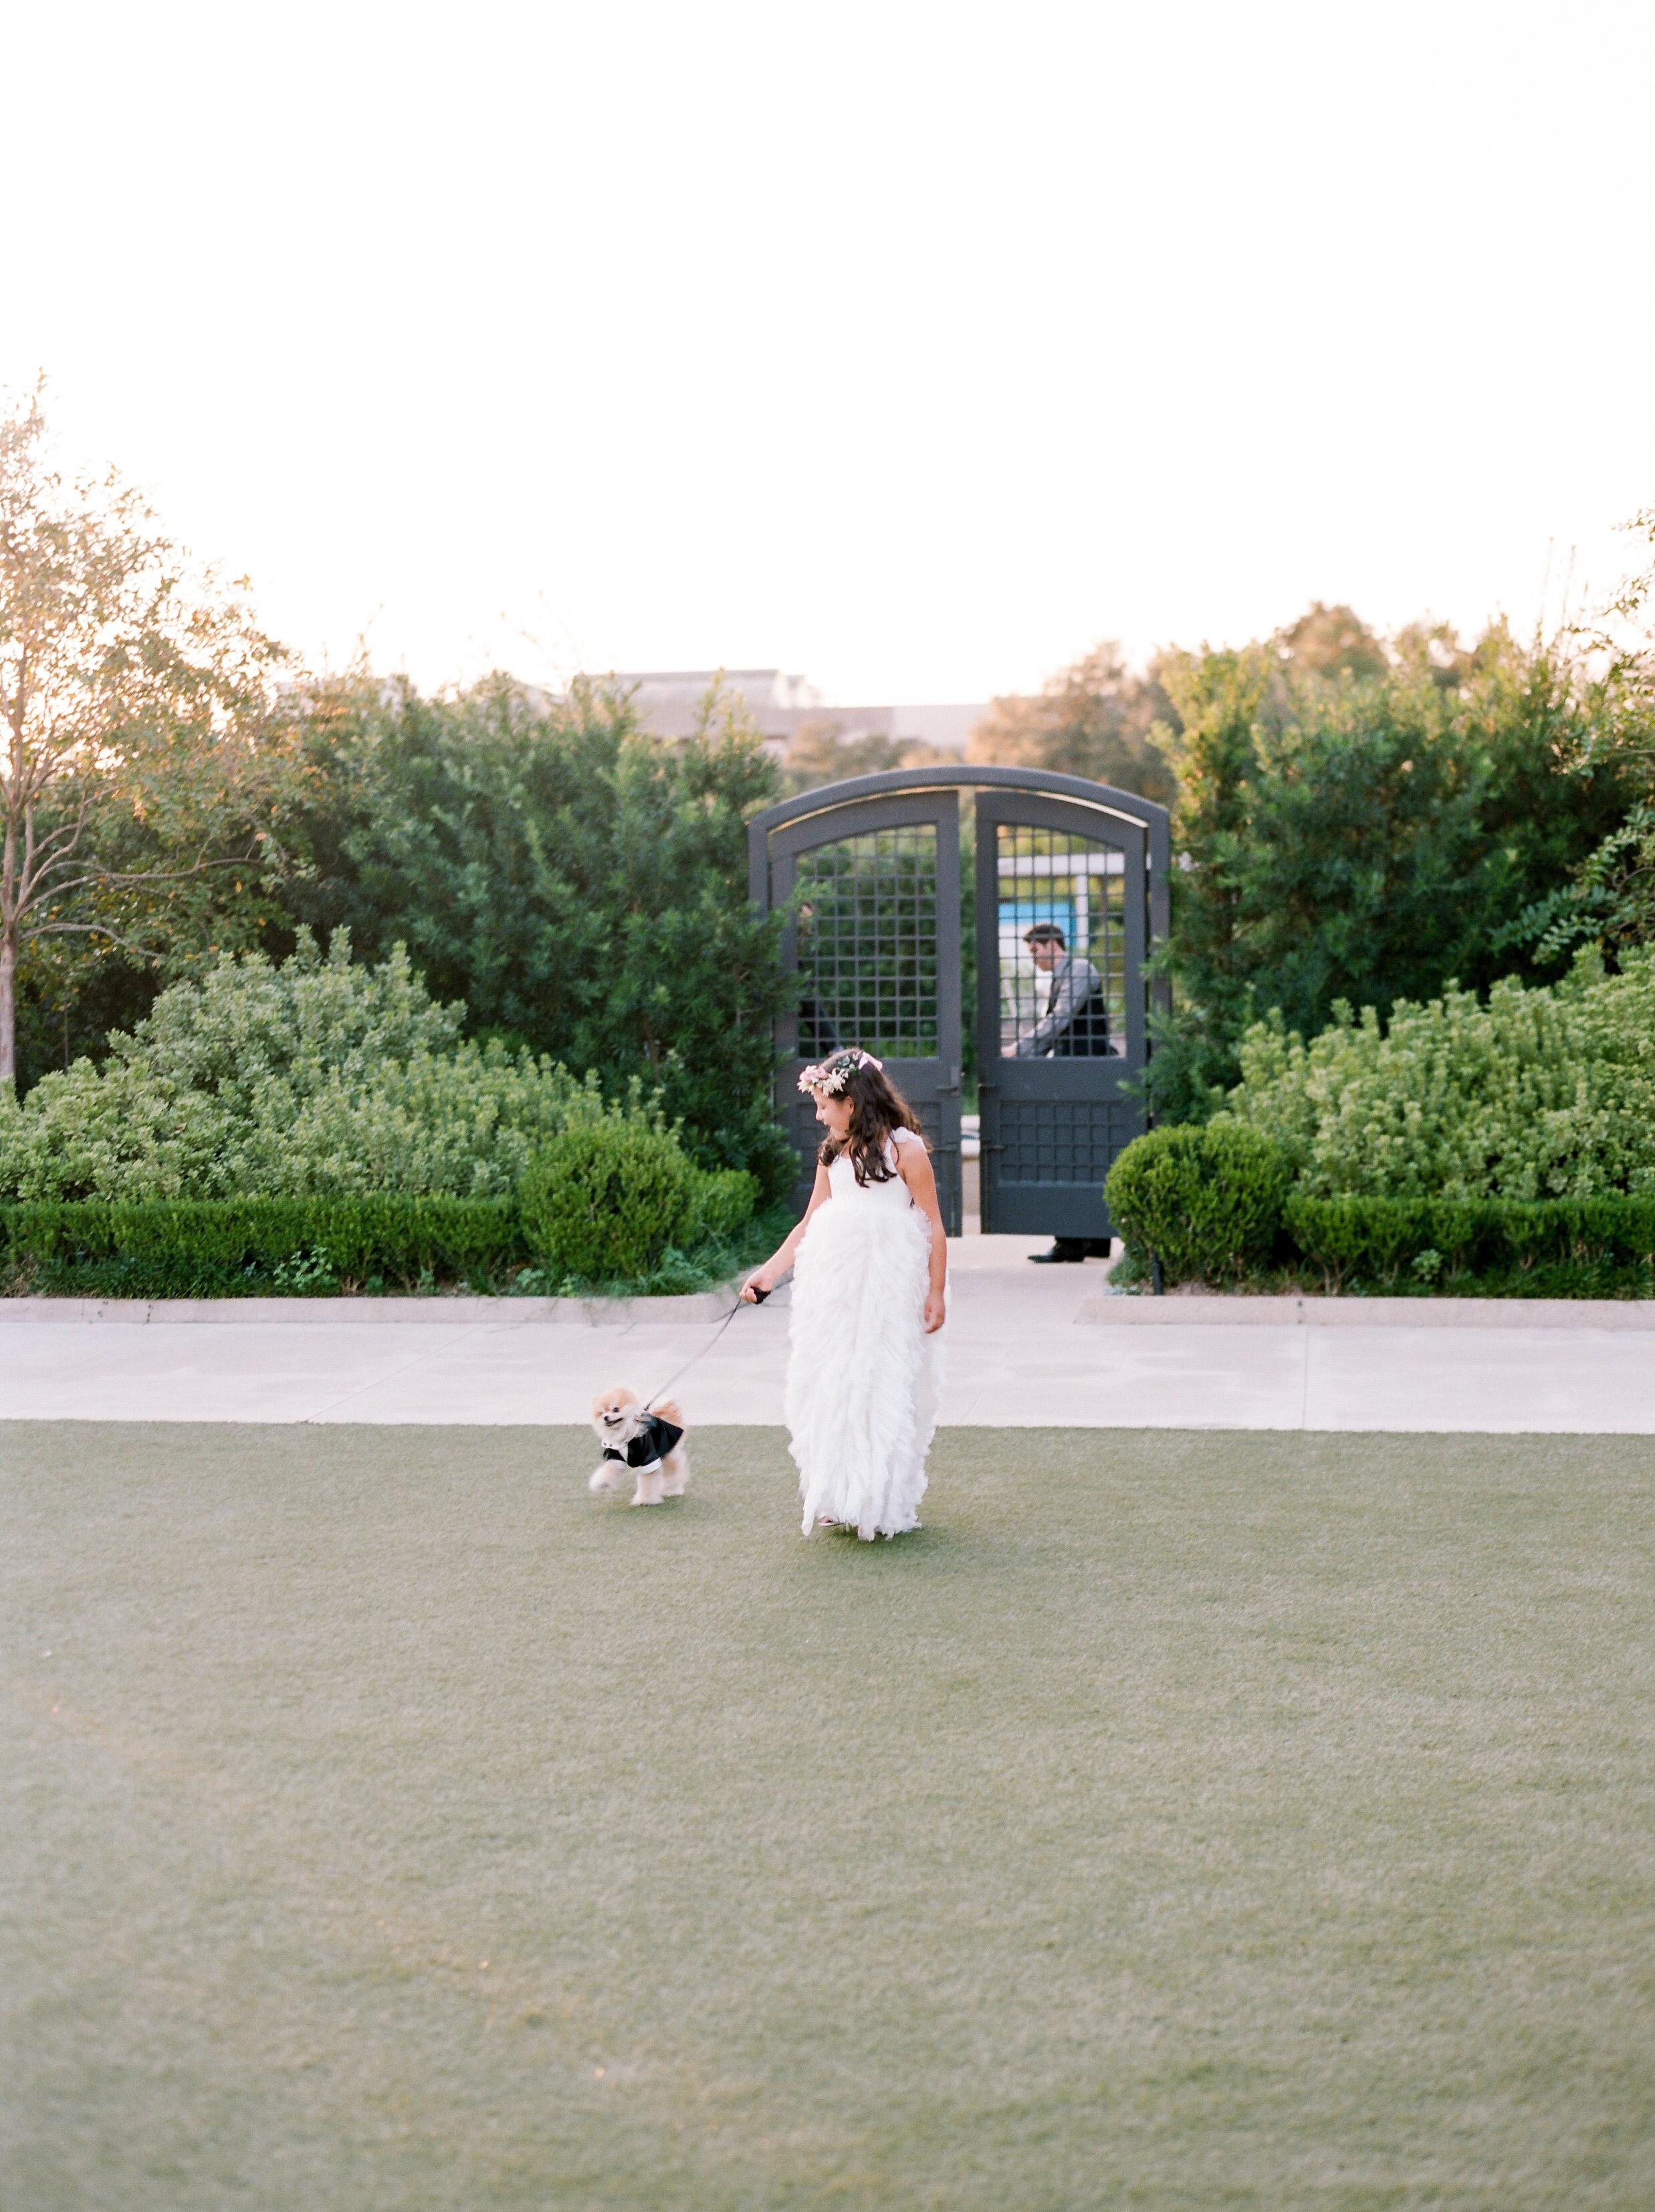 Martha-Stewart-Wedding-Dana-Fernandez-Photography-Josh-Texas-Film-Houston-Wedding-Fine-Art-Photographer-McGovern-Centennial-Gardens-Top-Best-115.jpg